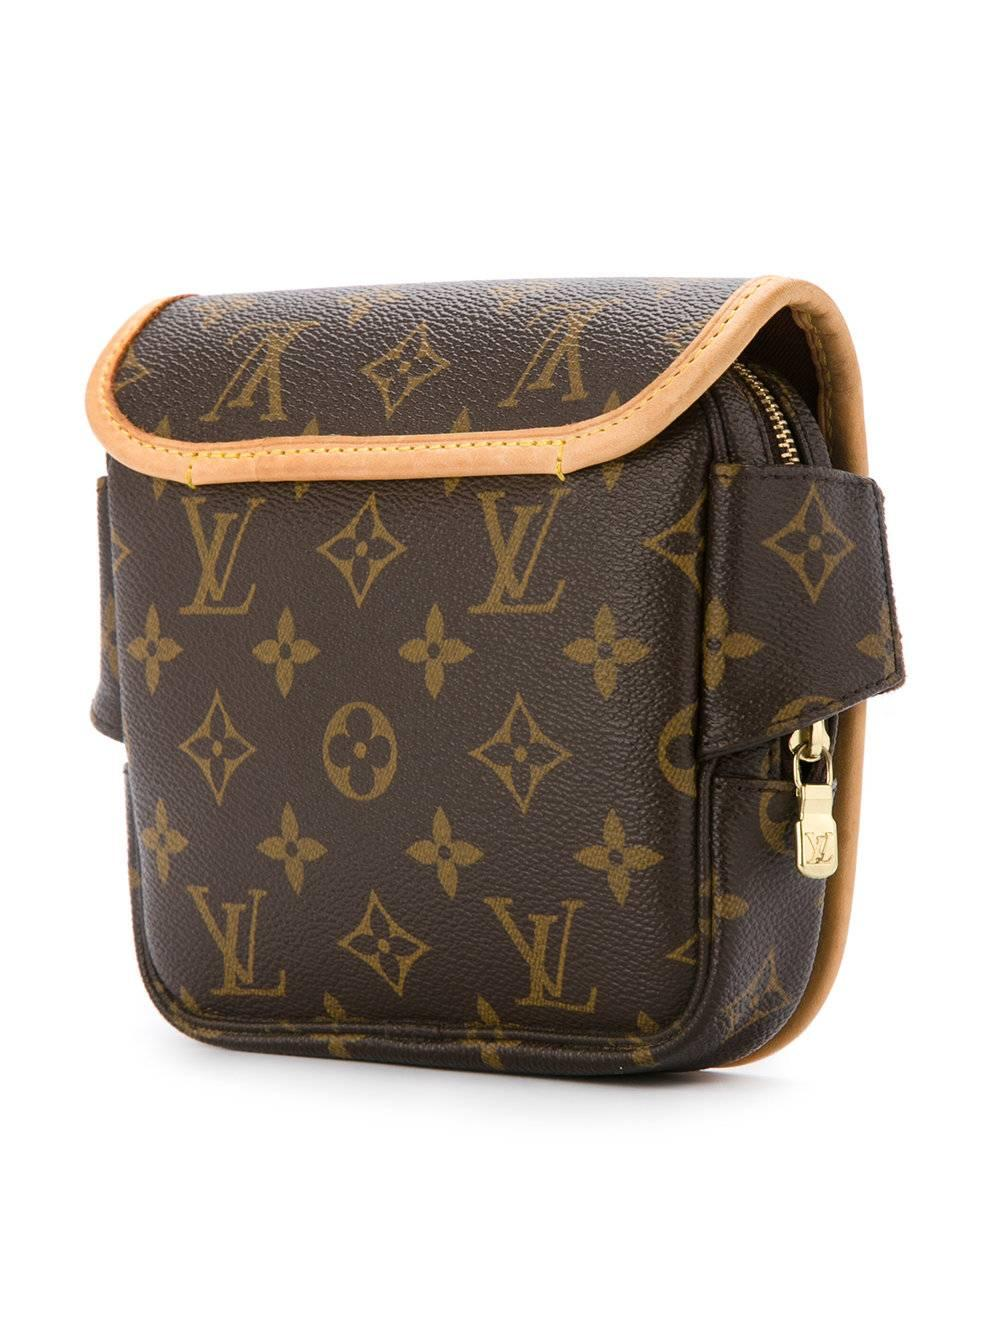 Louis Vuitton Monogram Mens Womens Fanny Pack Shoulder Waist Belt Bag sM3F1Dk691